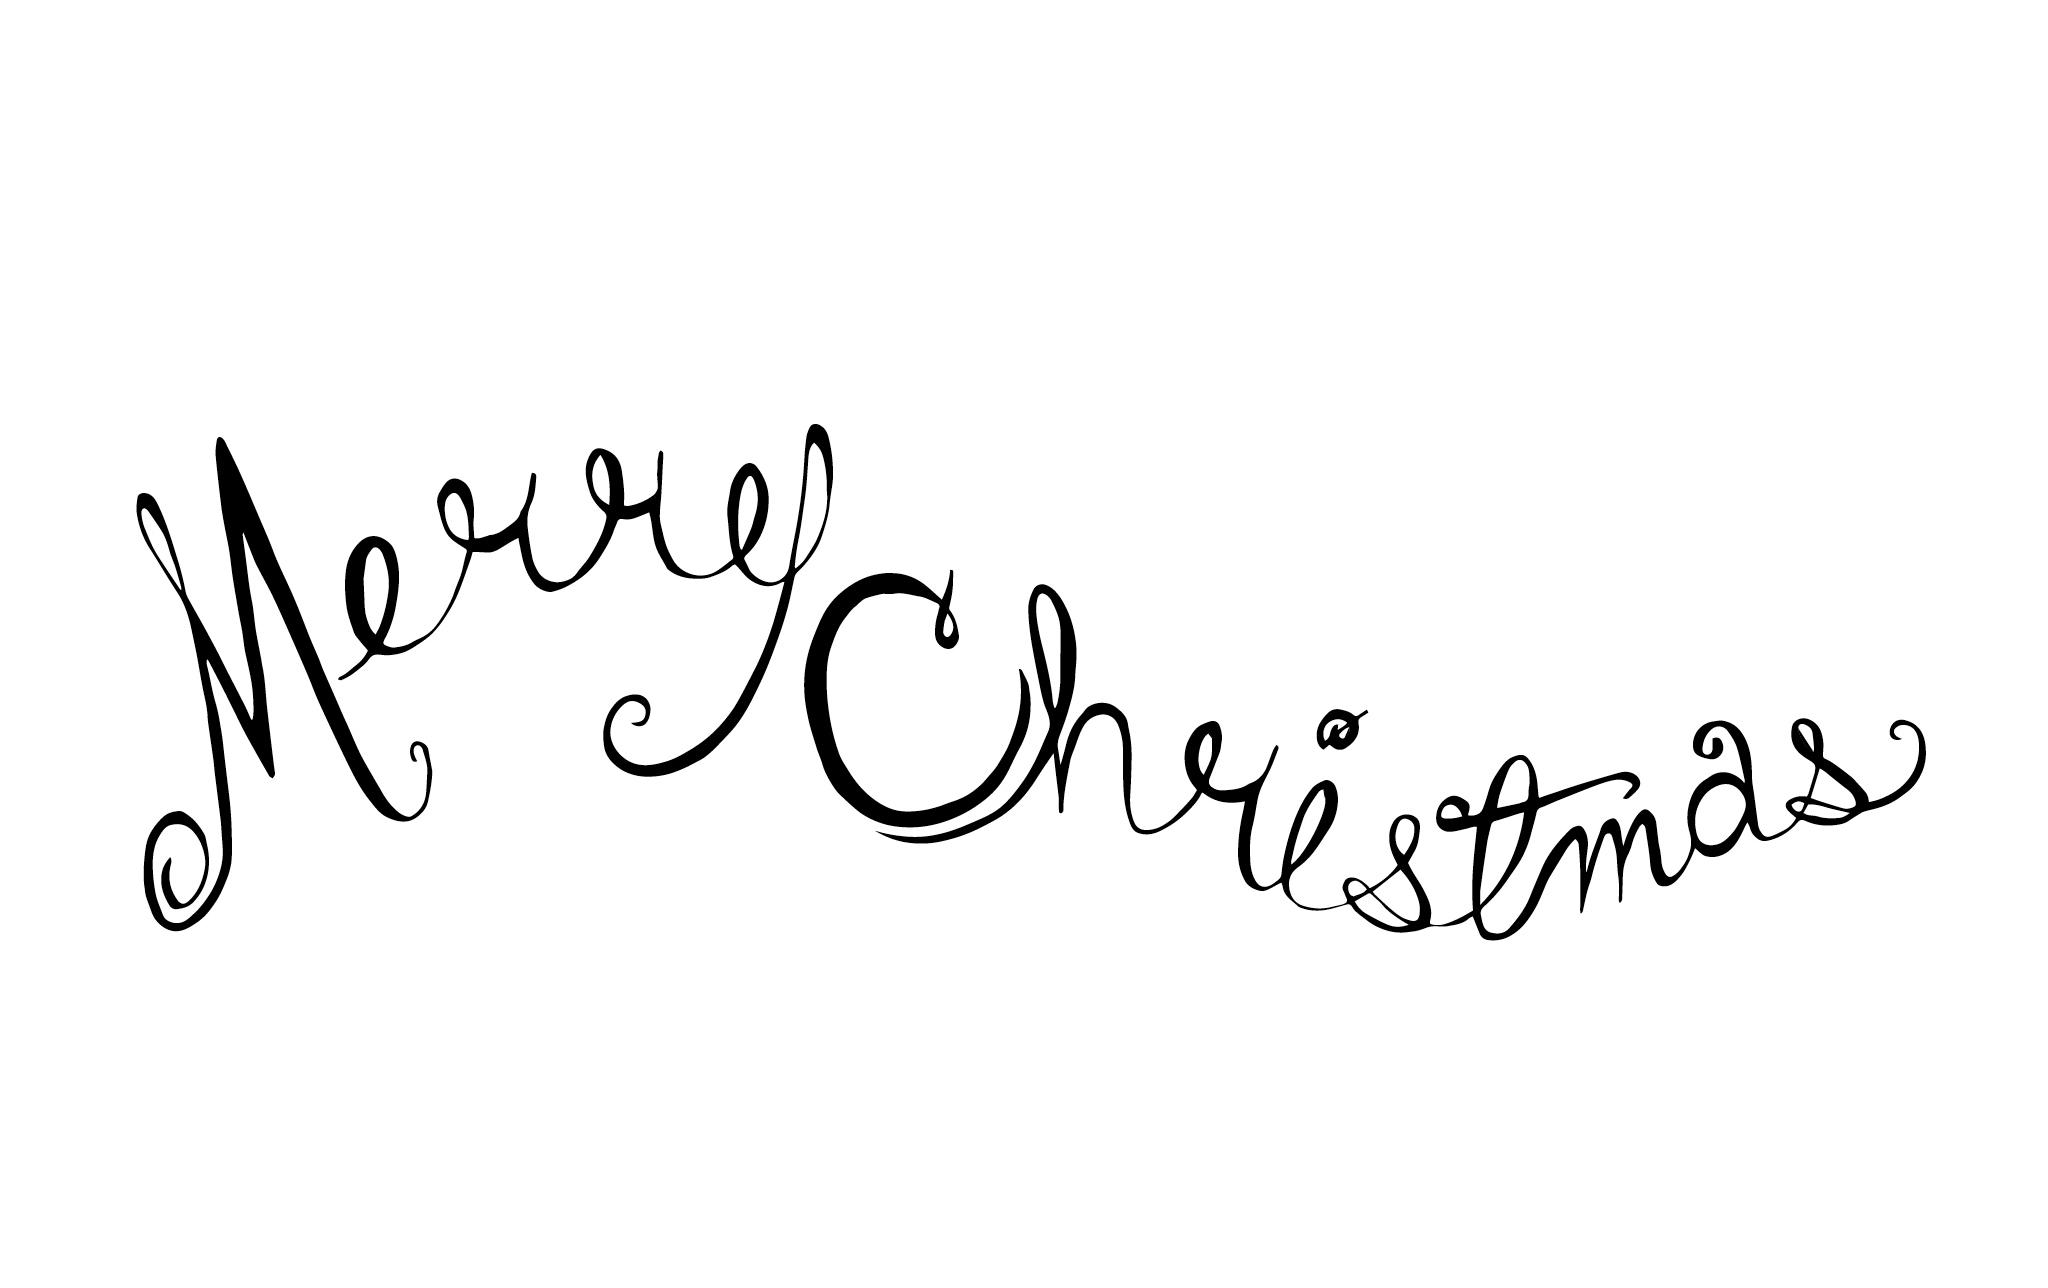 Inside of Christmas Wreath Card; Pen